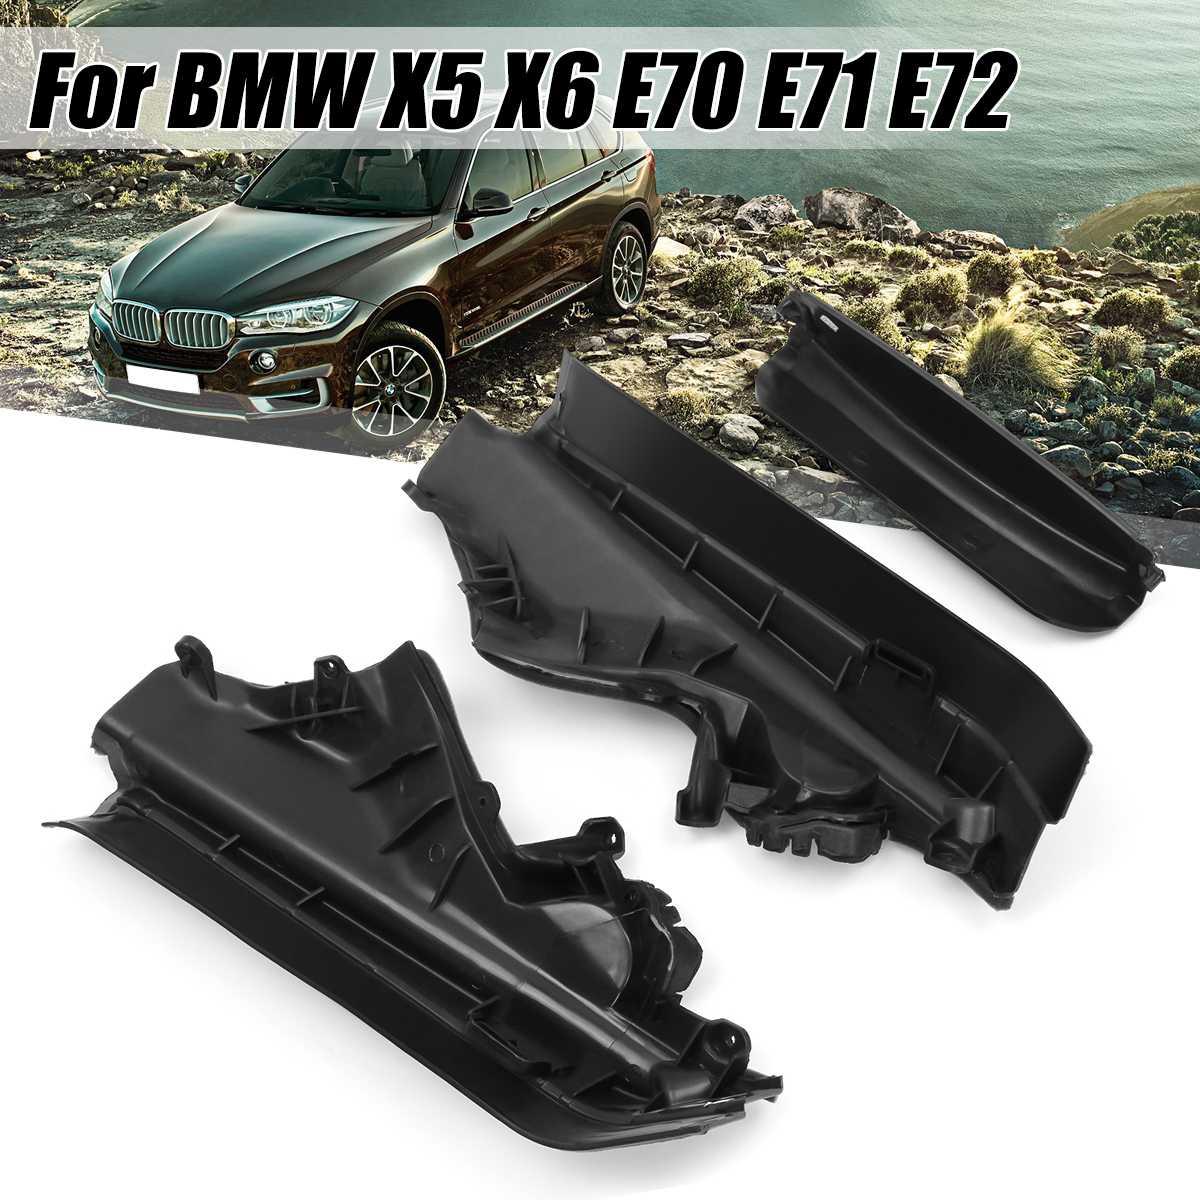 3 Piece Car Engine Upper Compartment Partition Panel Set For BMW X5 X6 E70 E71 E72 Engine Compartment 51717169420 51717169421